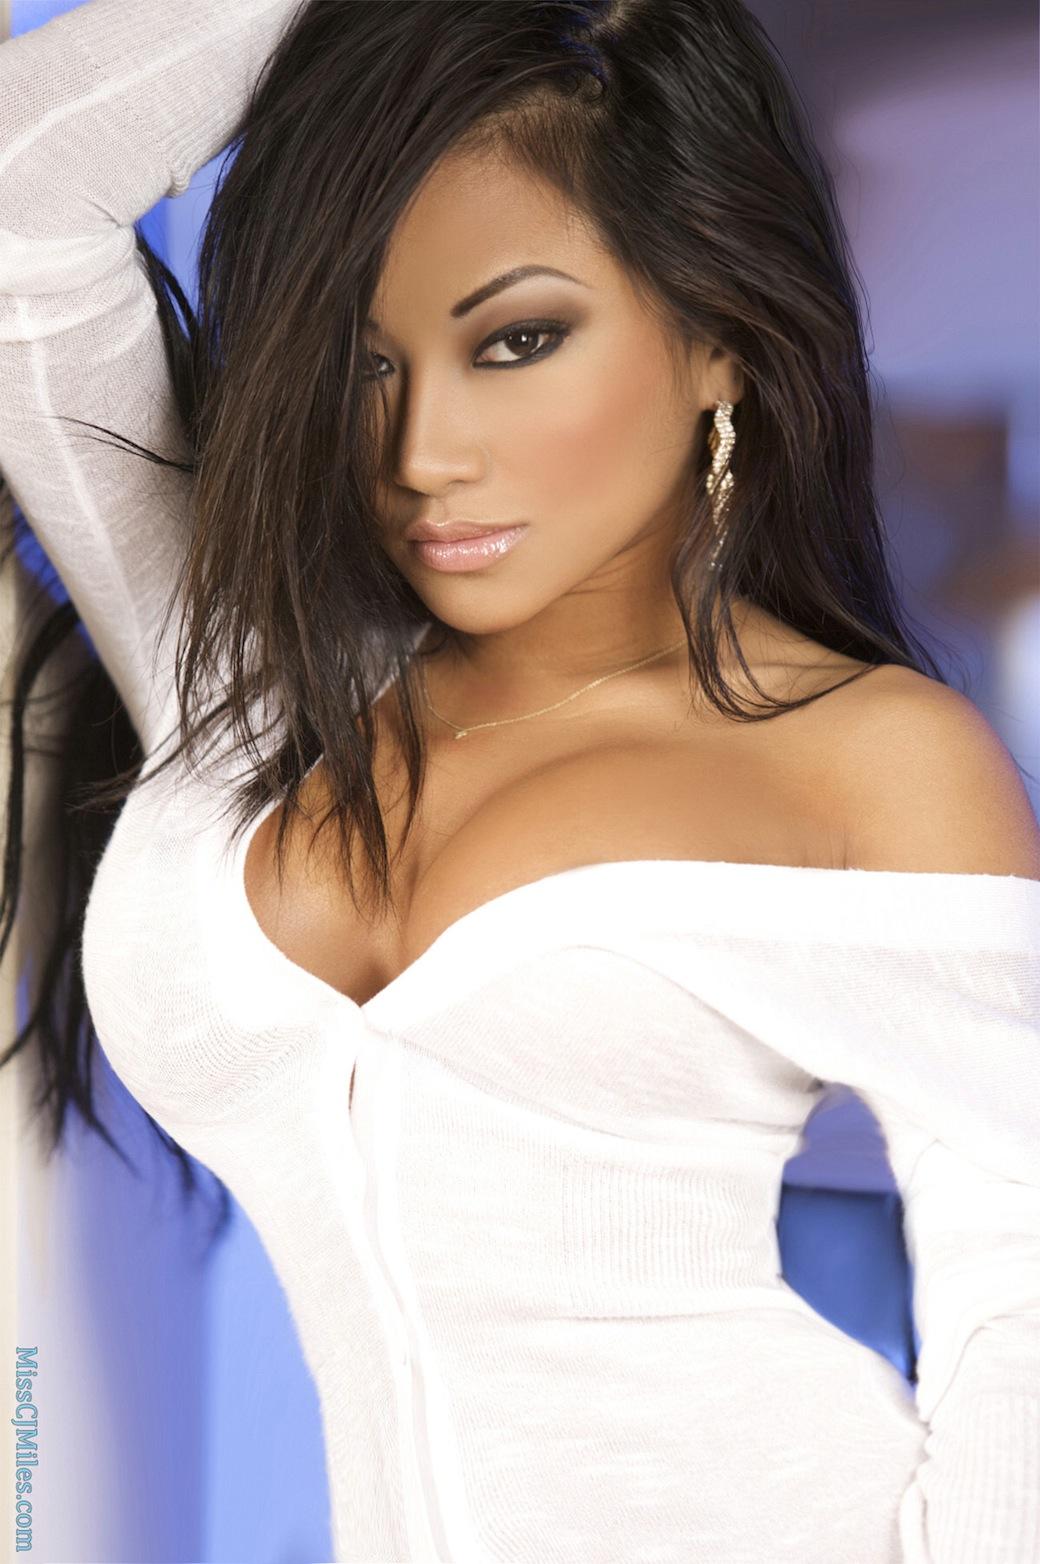 latina girl nude sexy